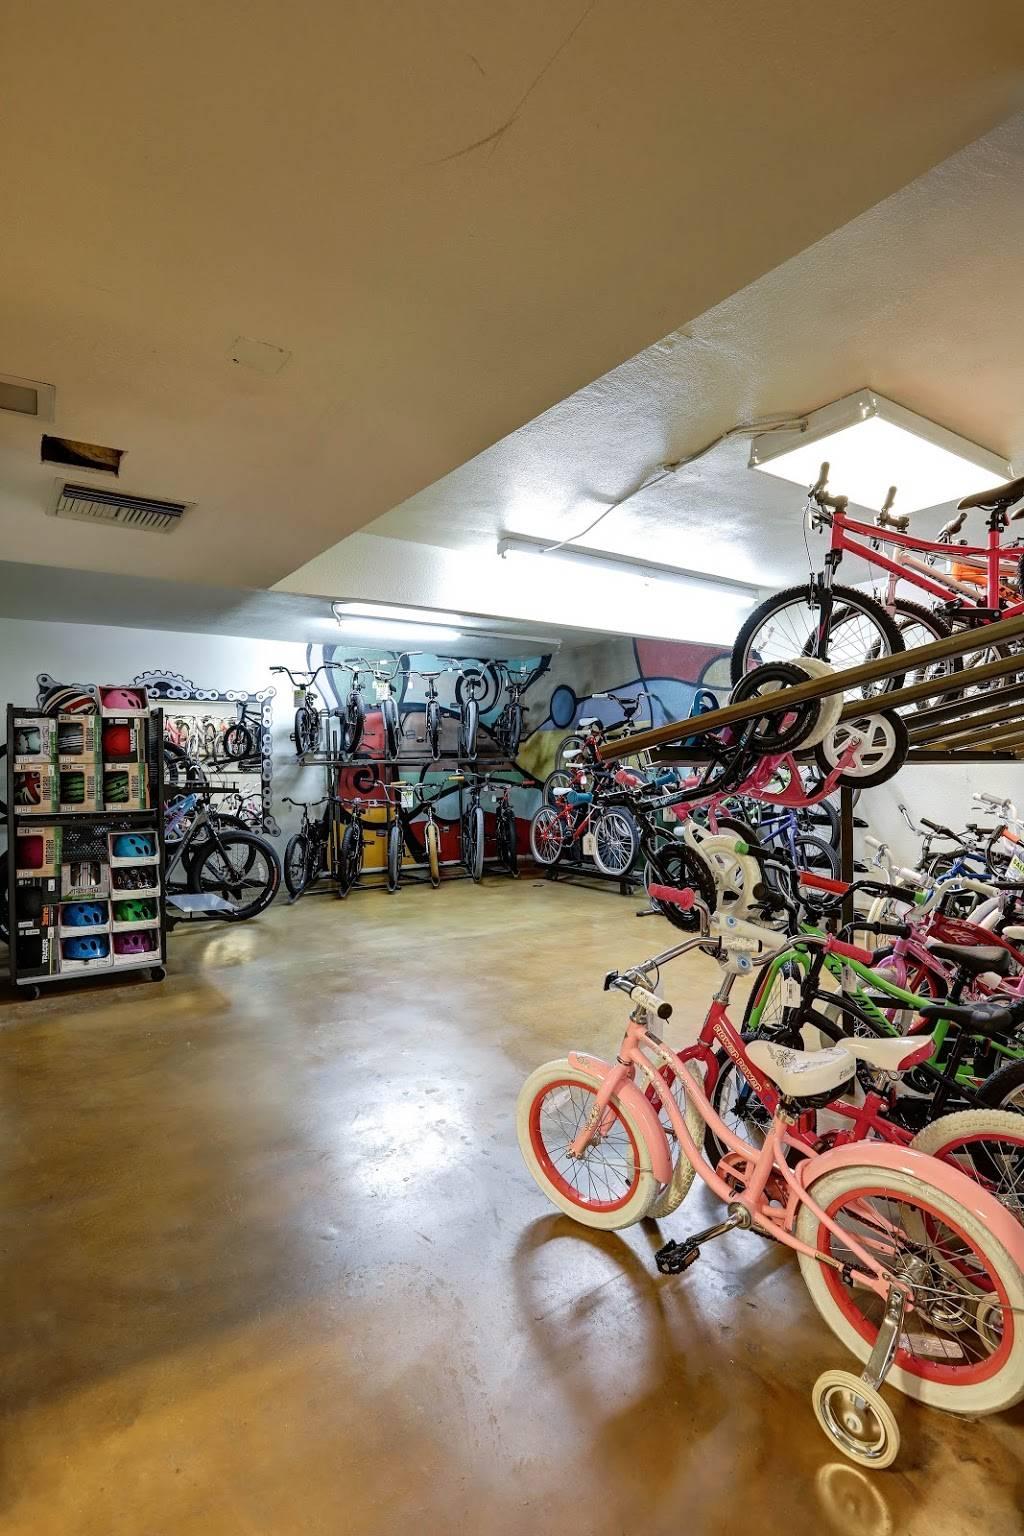 Landis Cyclery - bicycle store    Photo 8 of 10   Address: 712 W Indian School Rd, Phoenix, AZ 85013, USA   Phone: (602) 264-5681